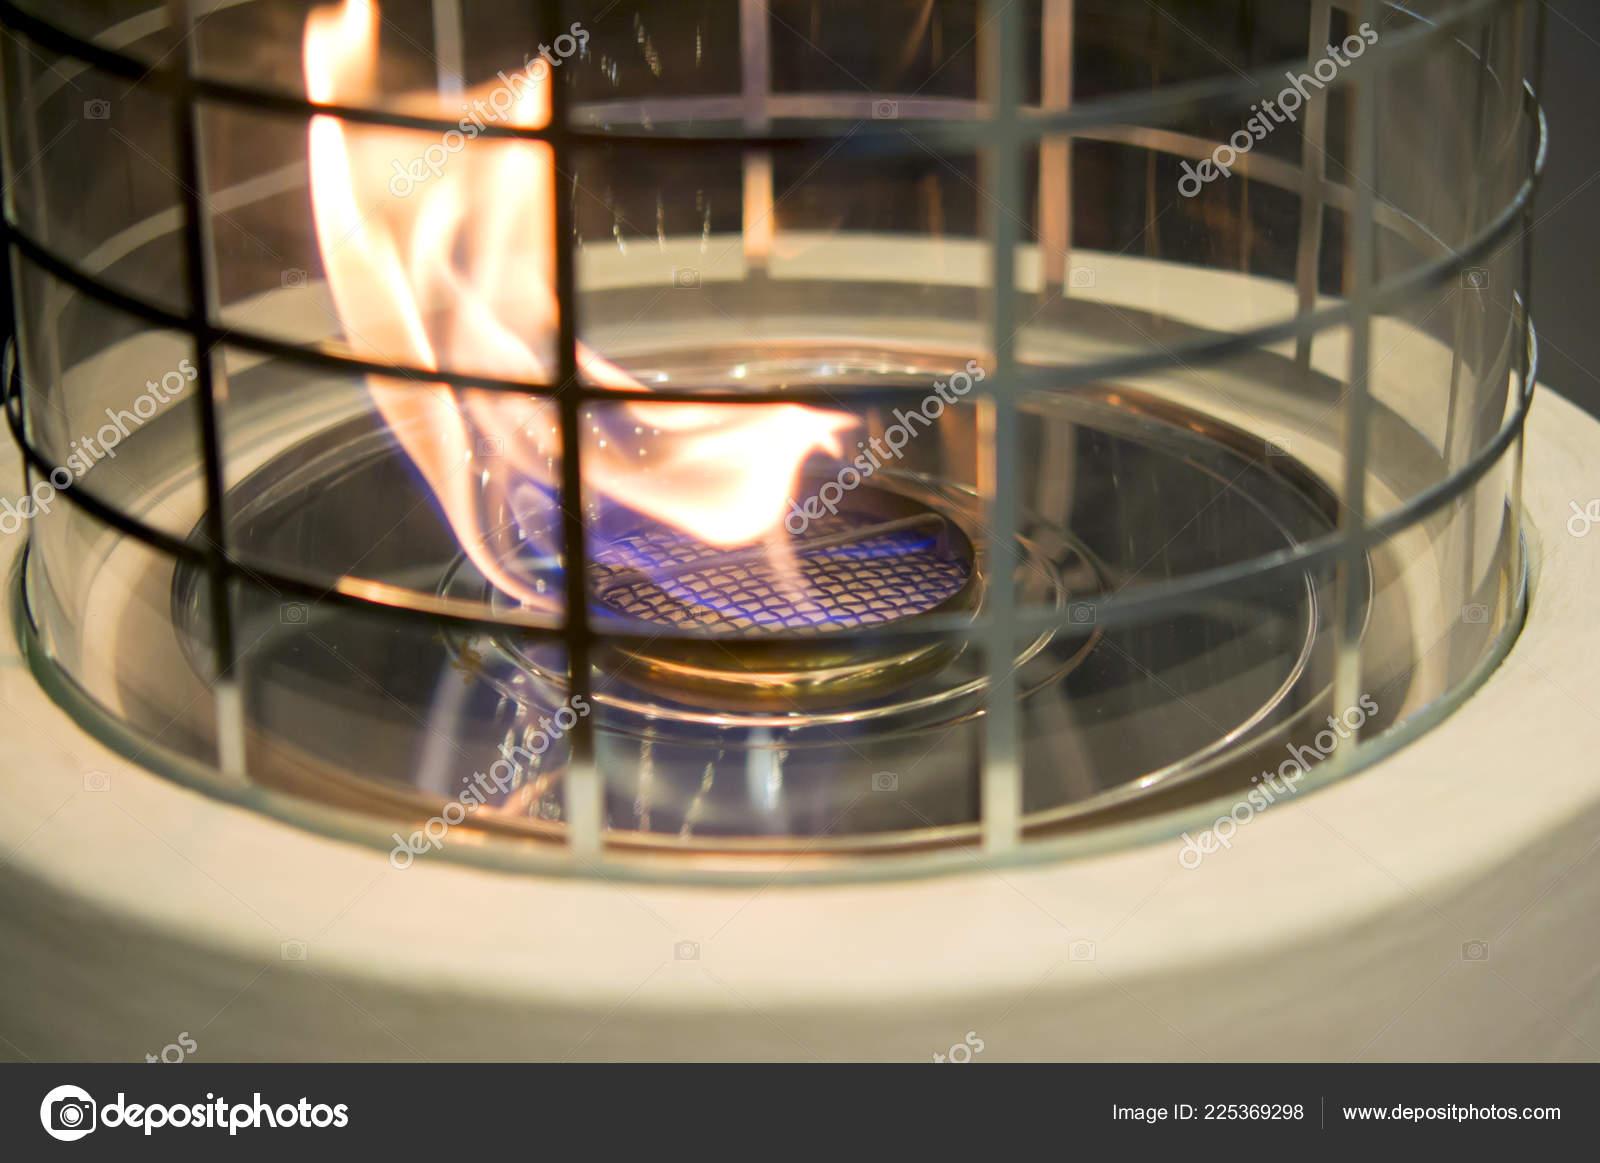 Moderni Bio Krb Fireplot Na Etanol Plyn Plamen Plynovy Sporak